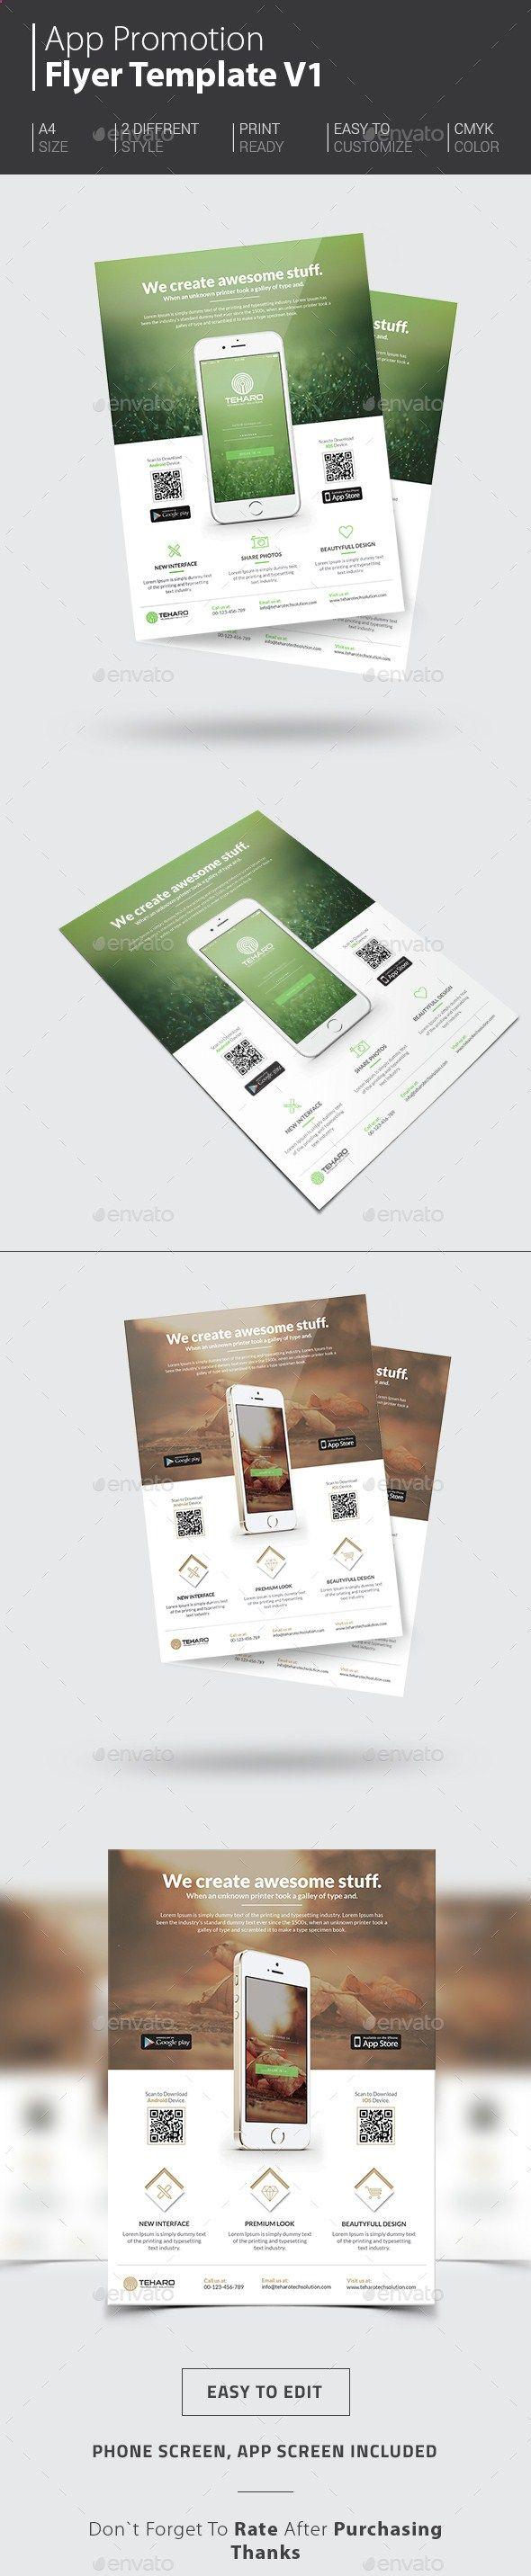 #App_Promotion_Flyer graphicriver.net/...